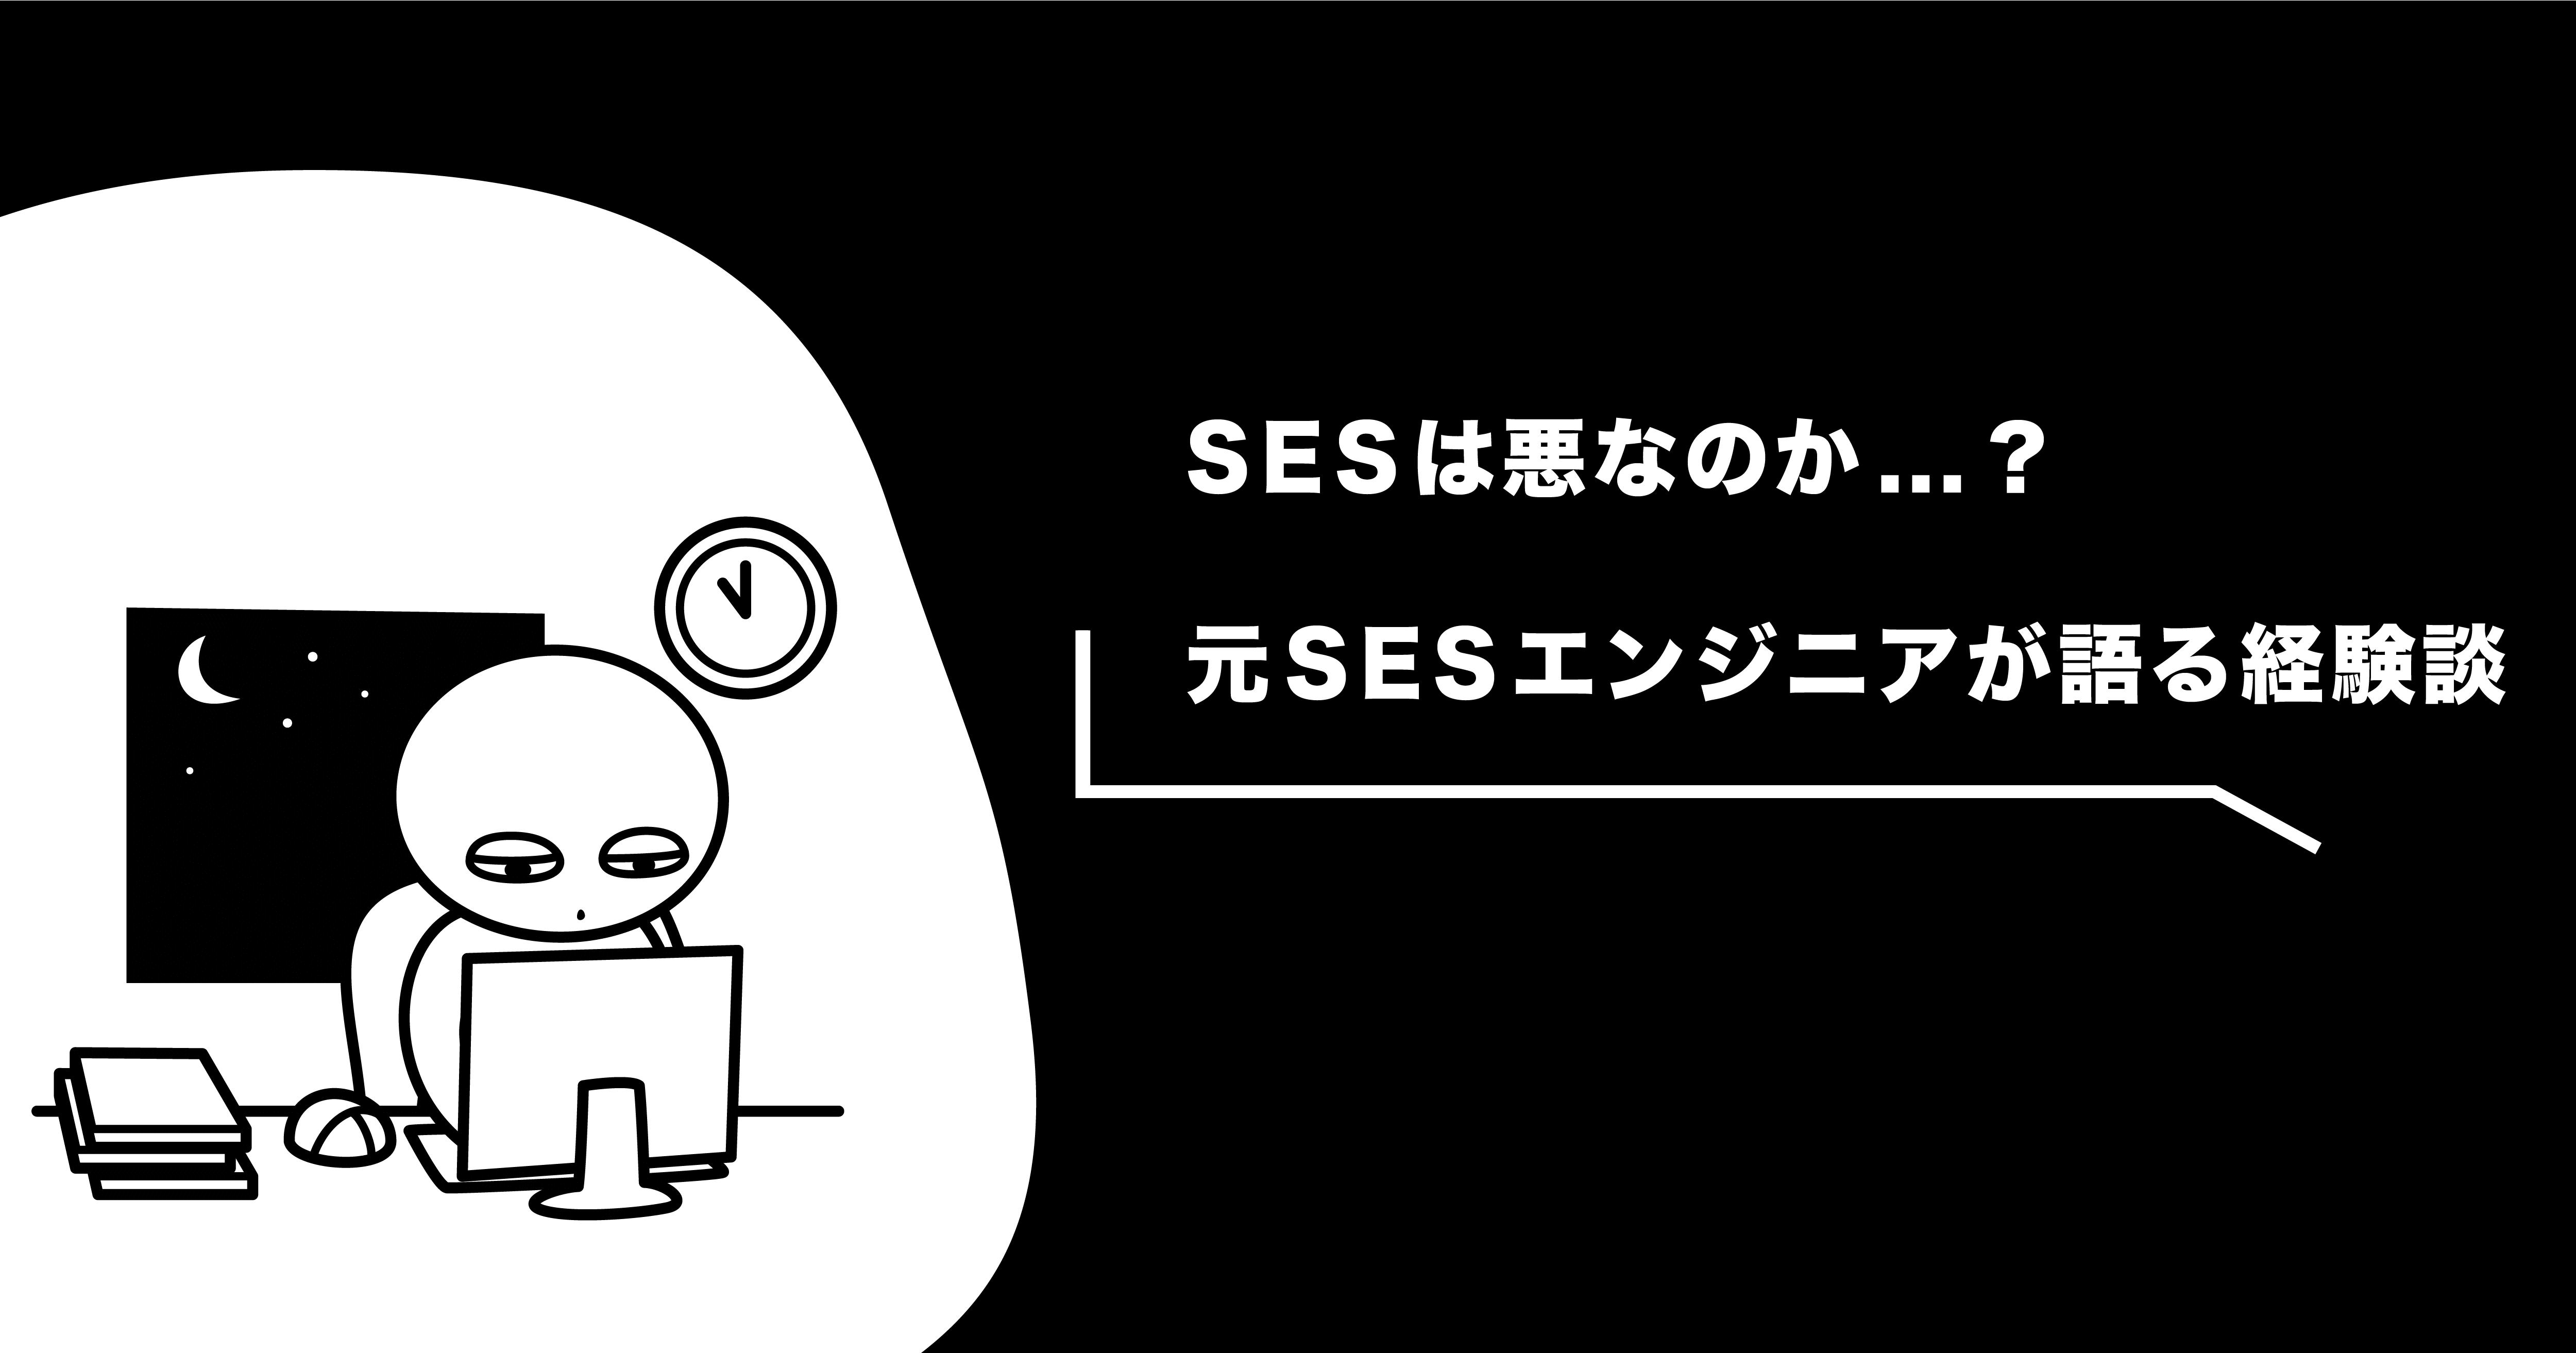 SESは悪なのか..._元SESエンジニアが語る経験談